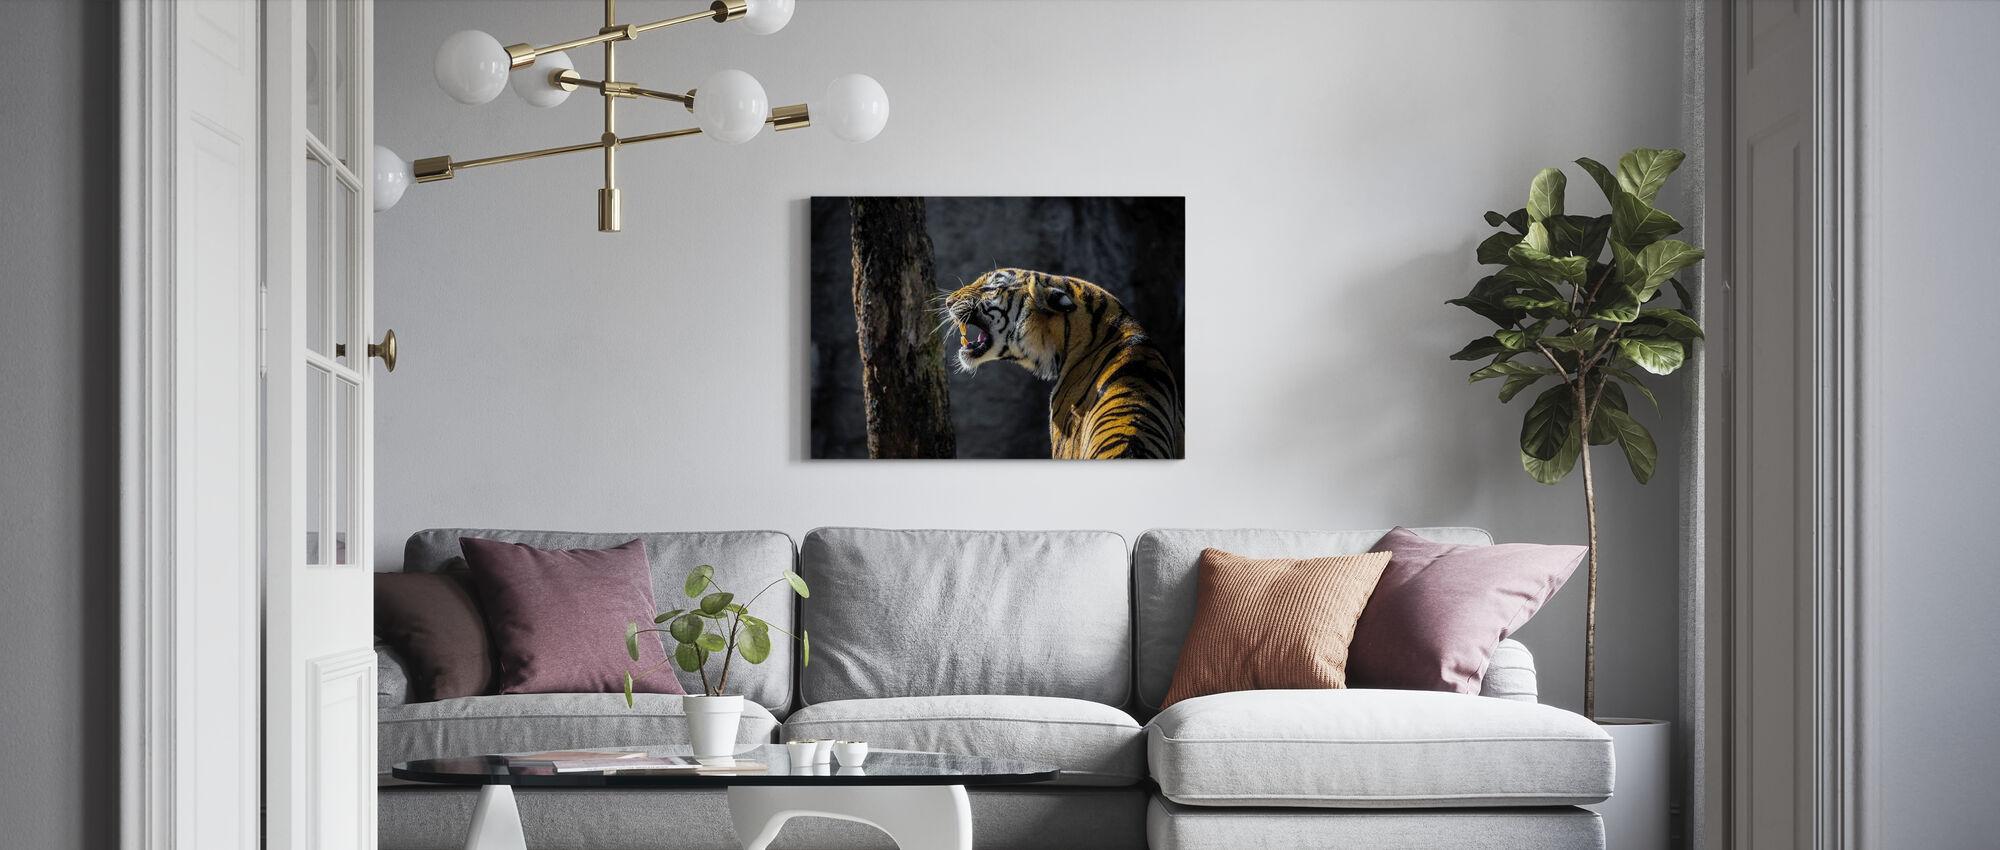 Tijger brullend - Canvas print - Woonkamer